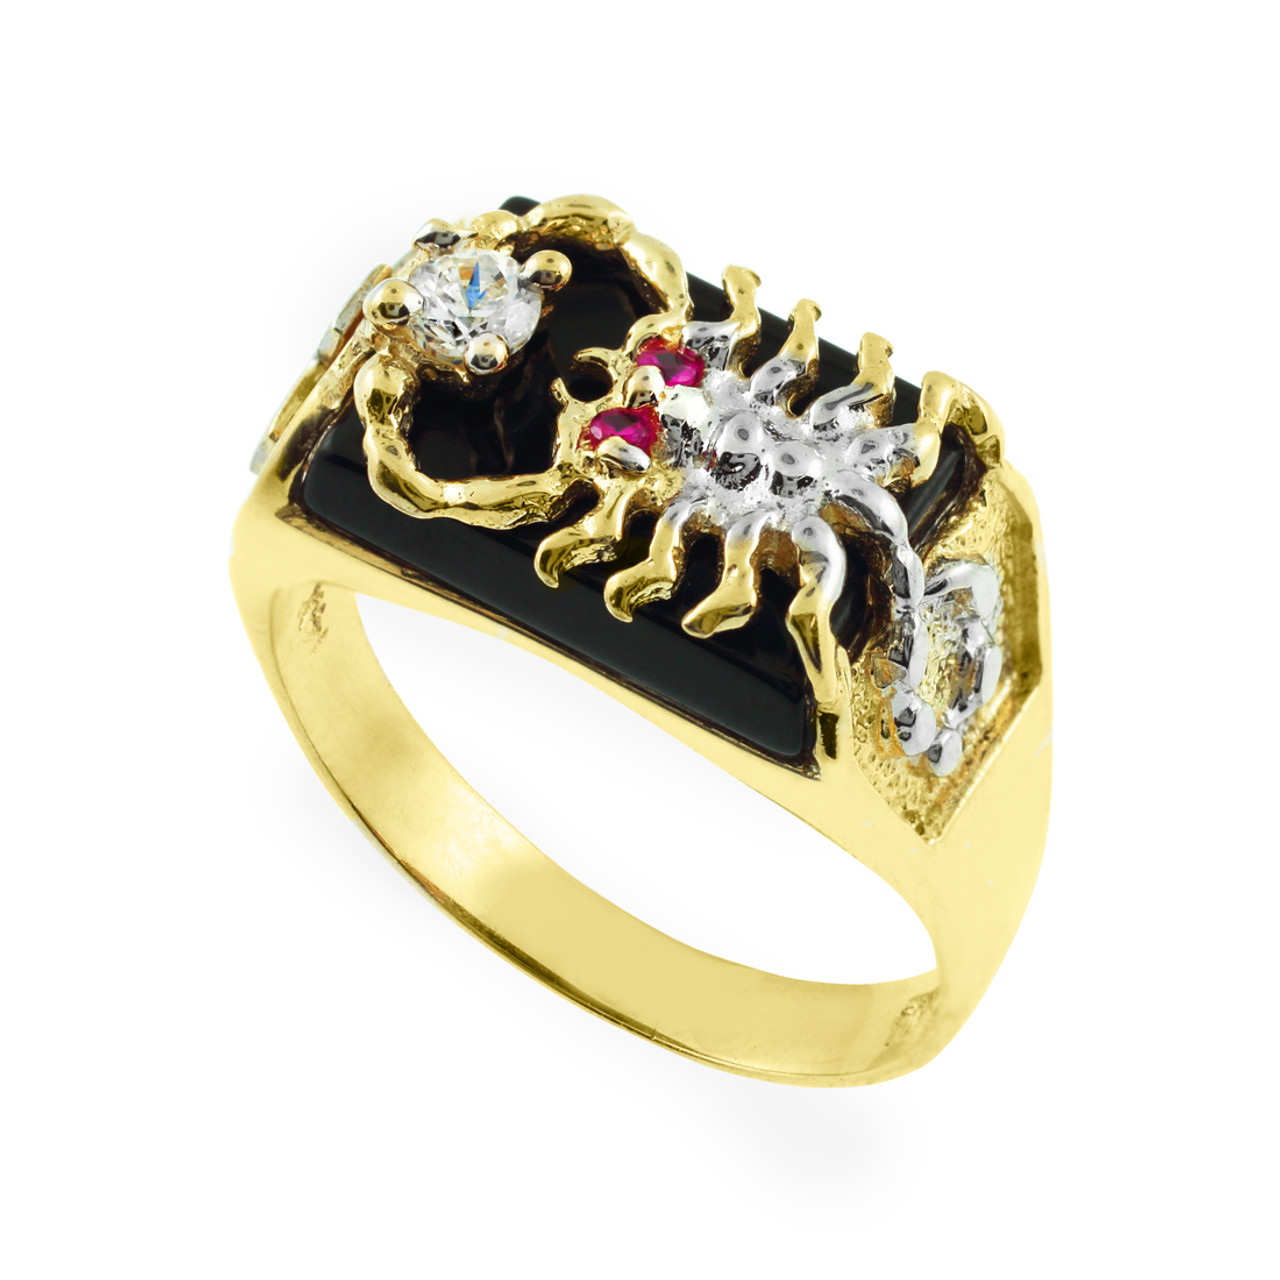 men 39 s gold black onyx scorpion ring. Black Bedroom Furniture Sets. Home Design Ideas